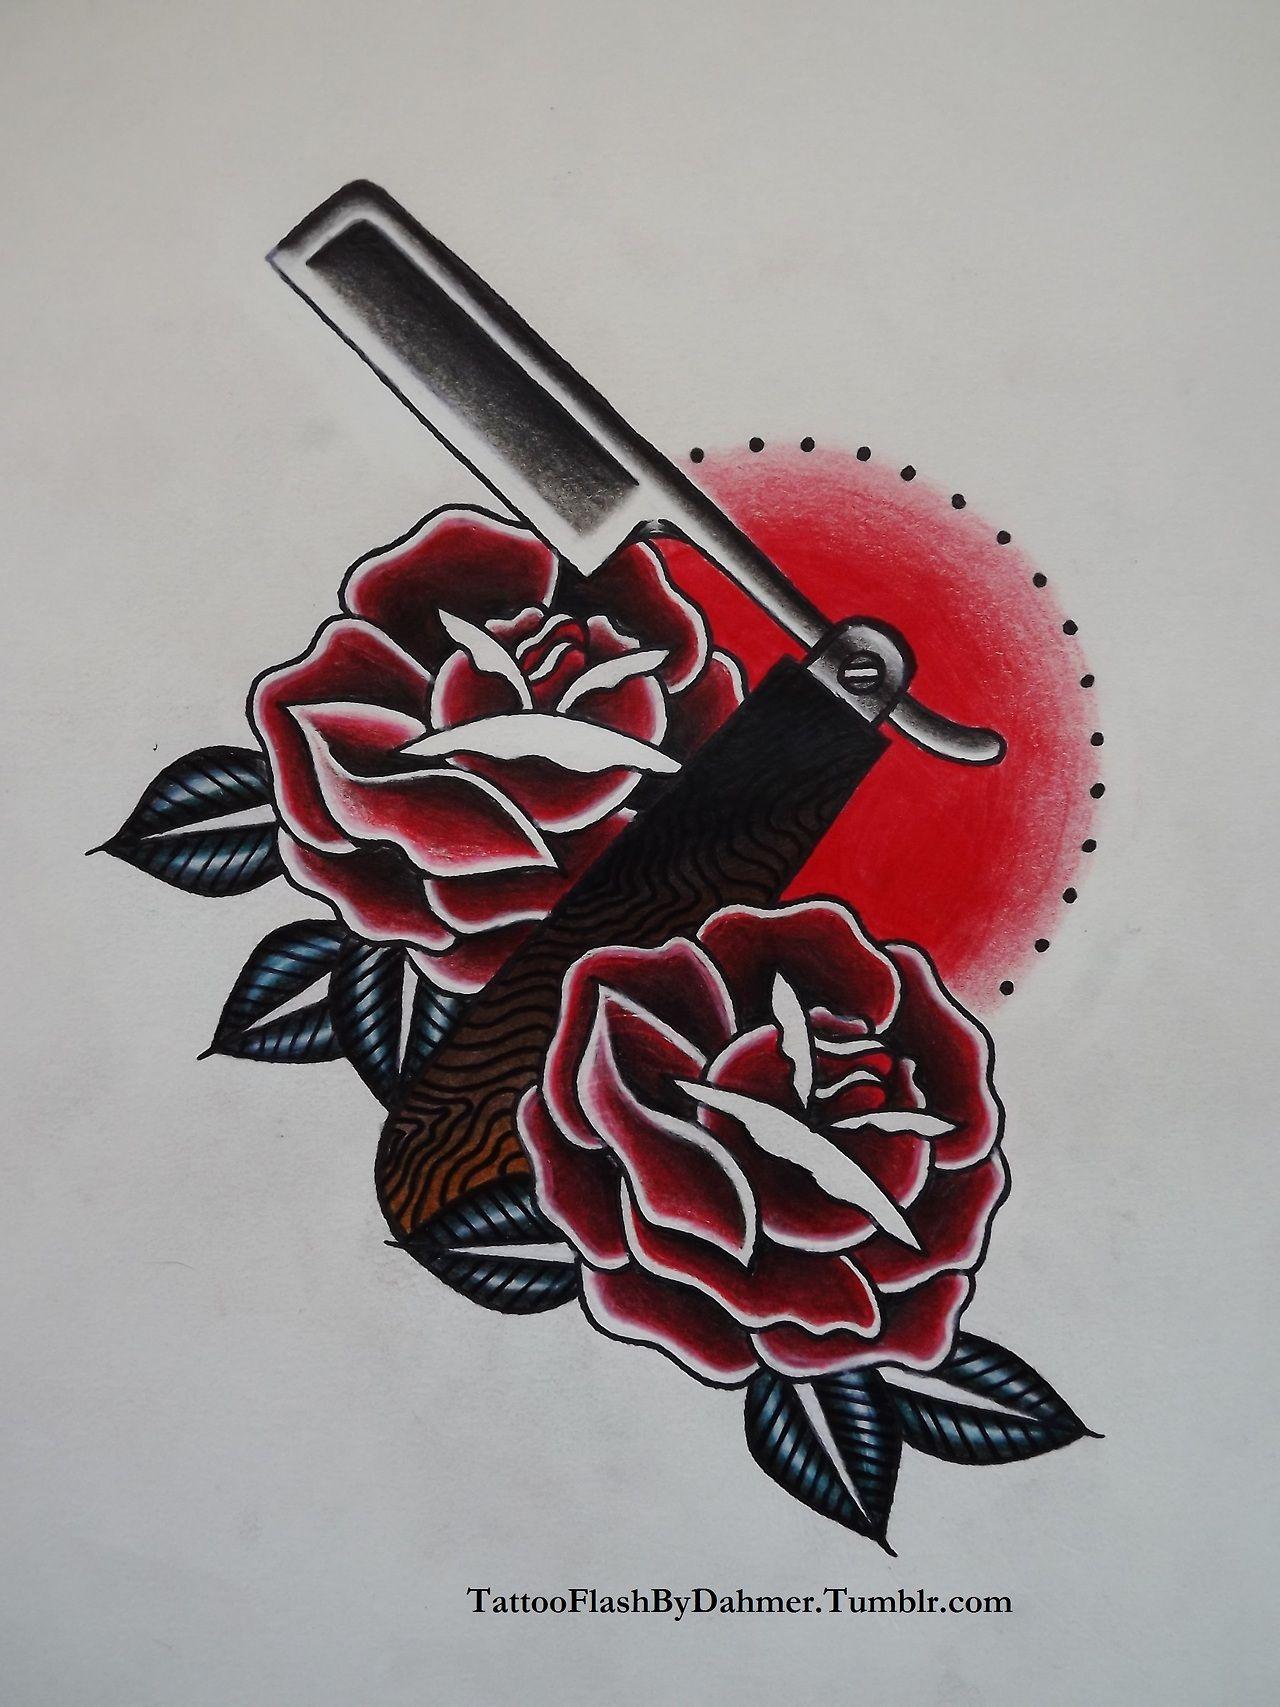 Tattoo Meaning Razor: Razor Rose Traditional Tattoo Flash